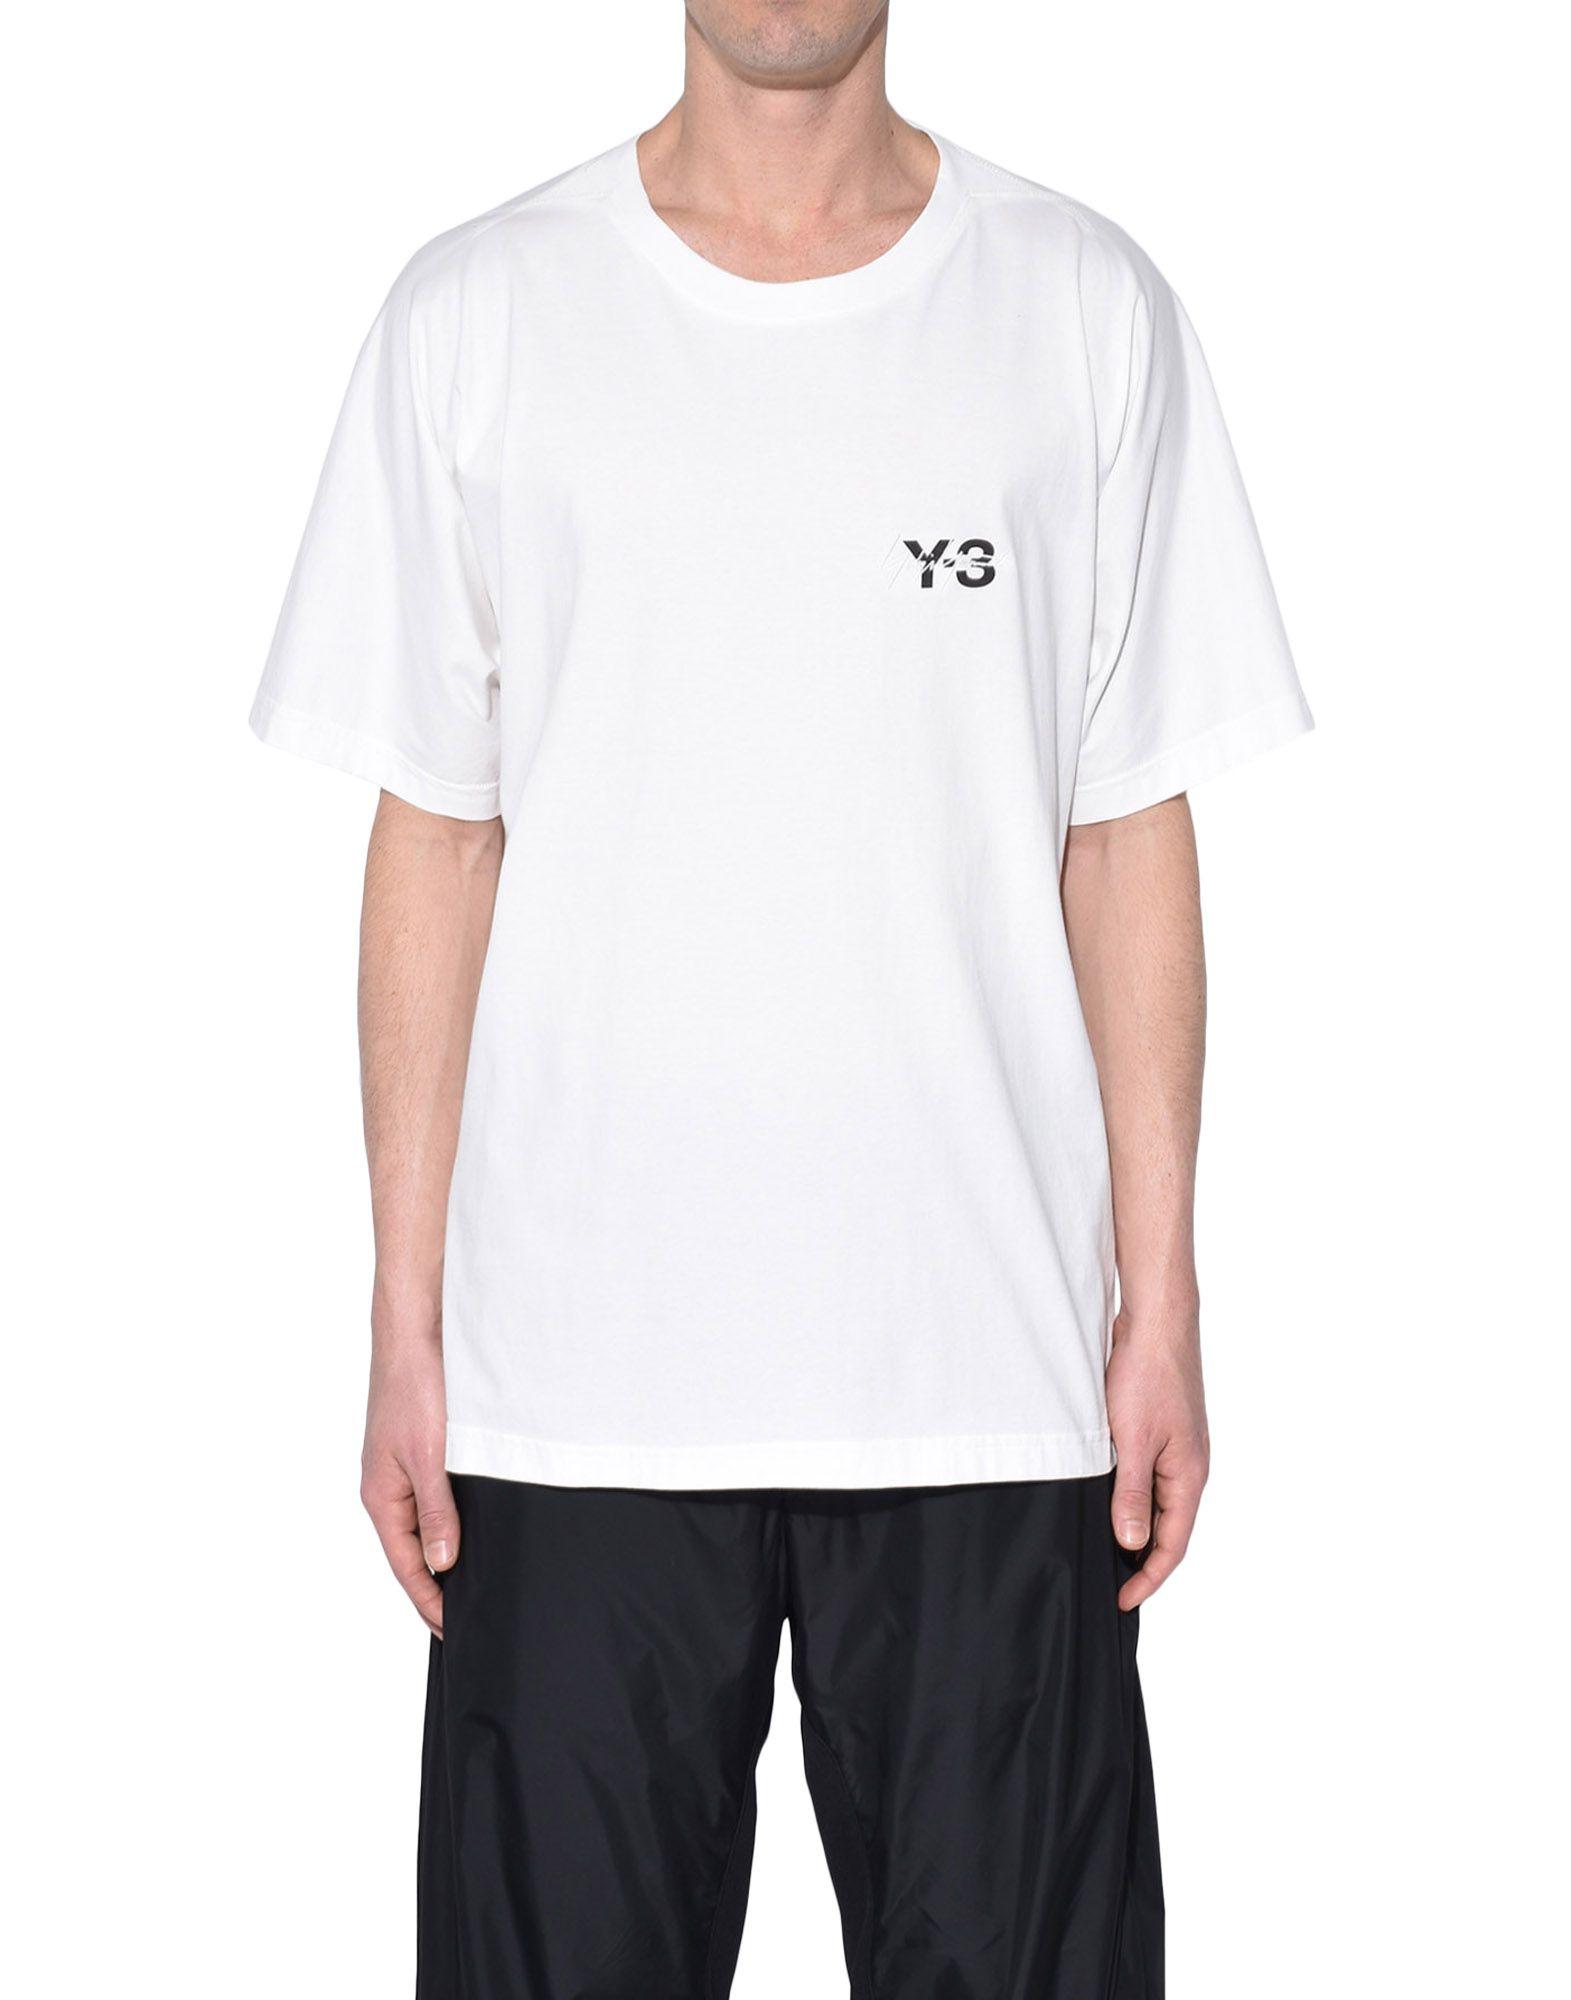 Y-3 Y-3 Signature Tee Short sleeve t-shirt Man r